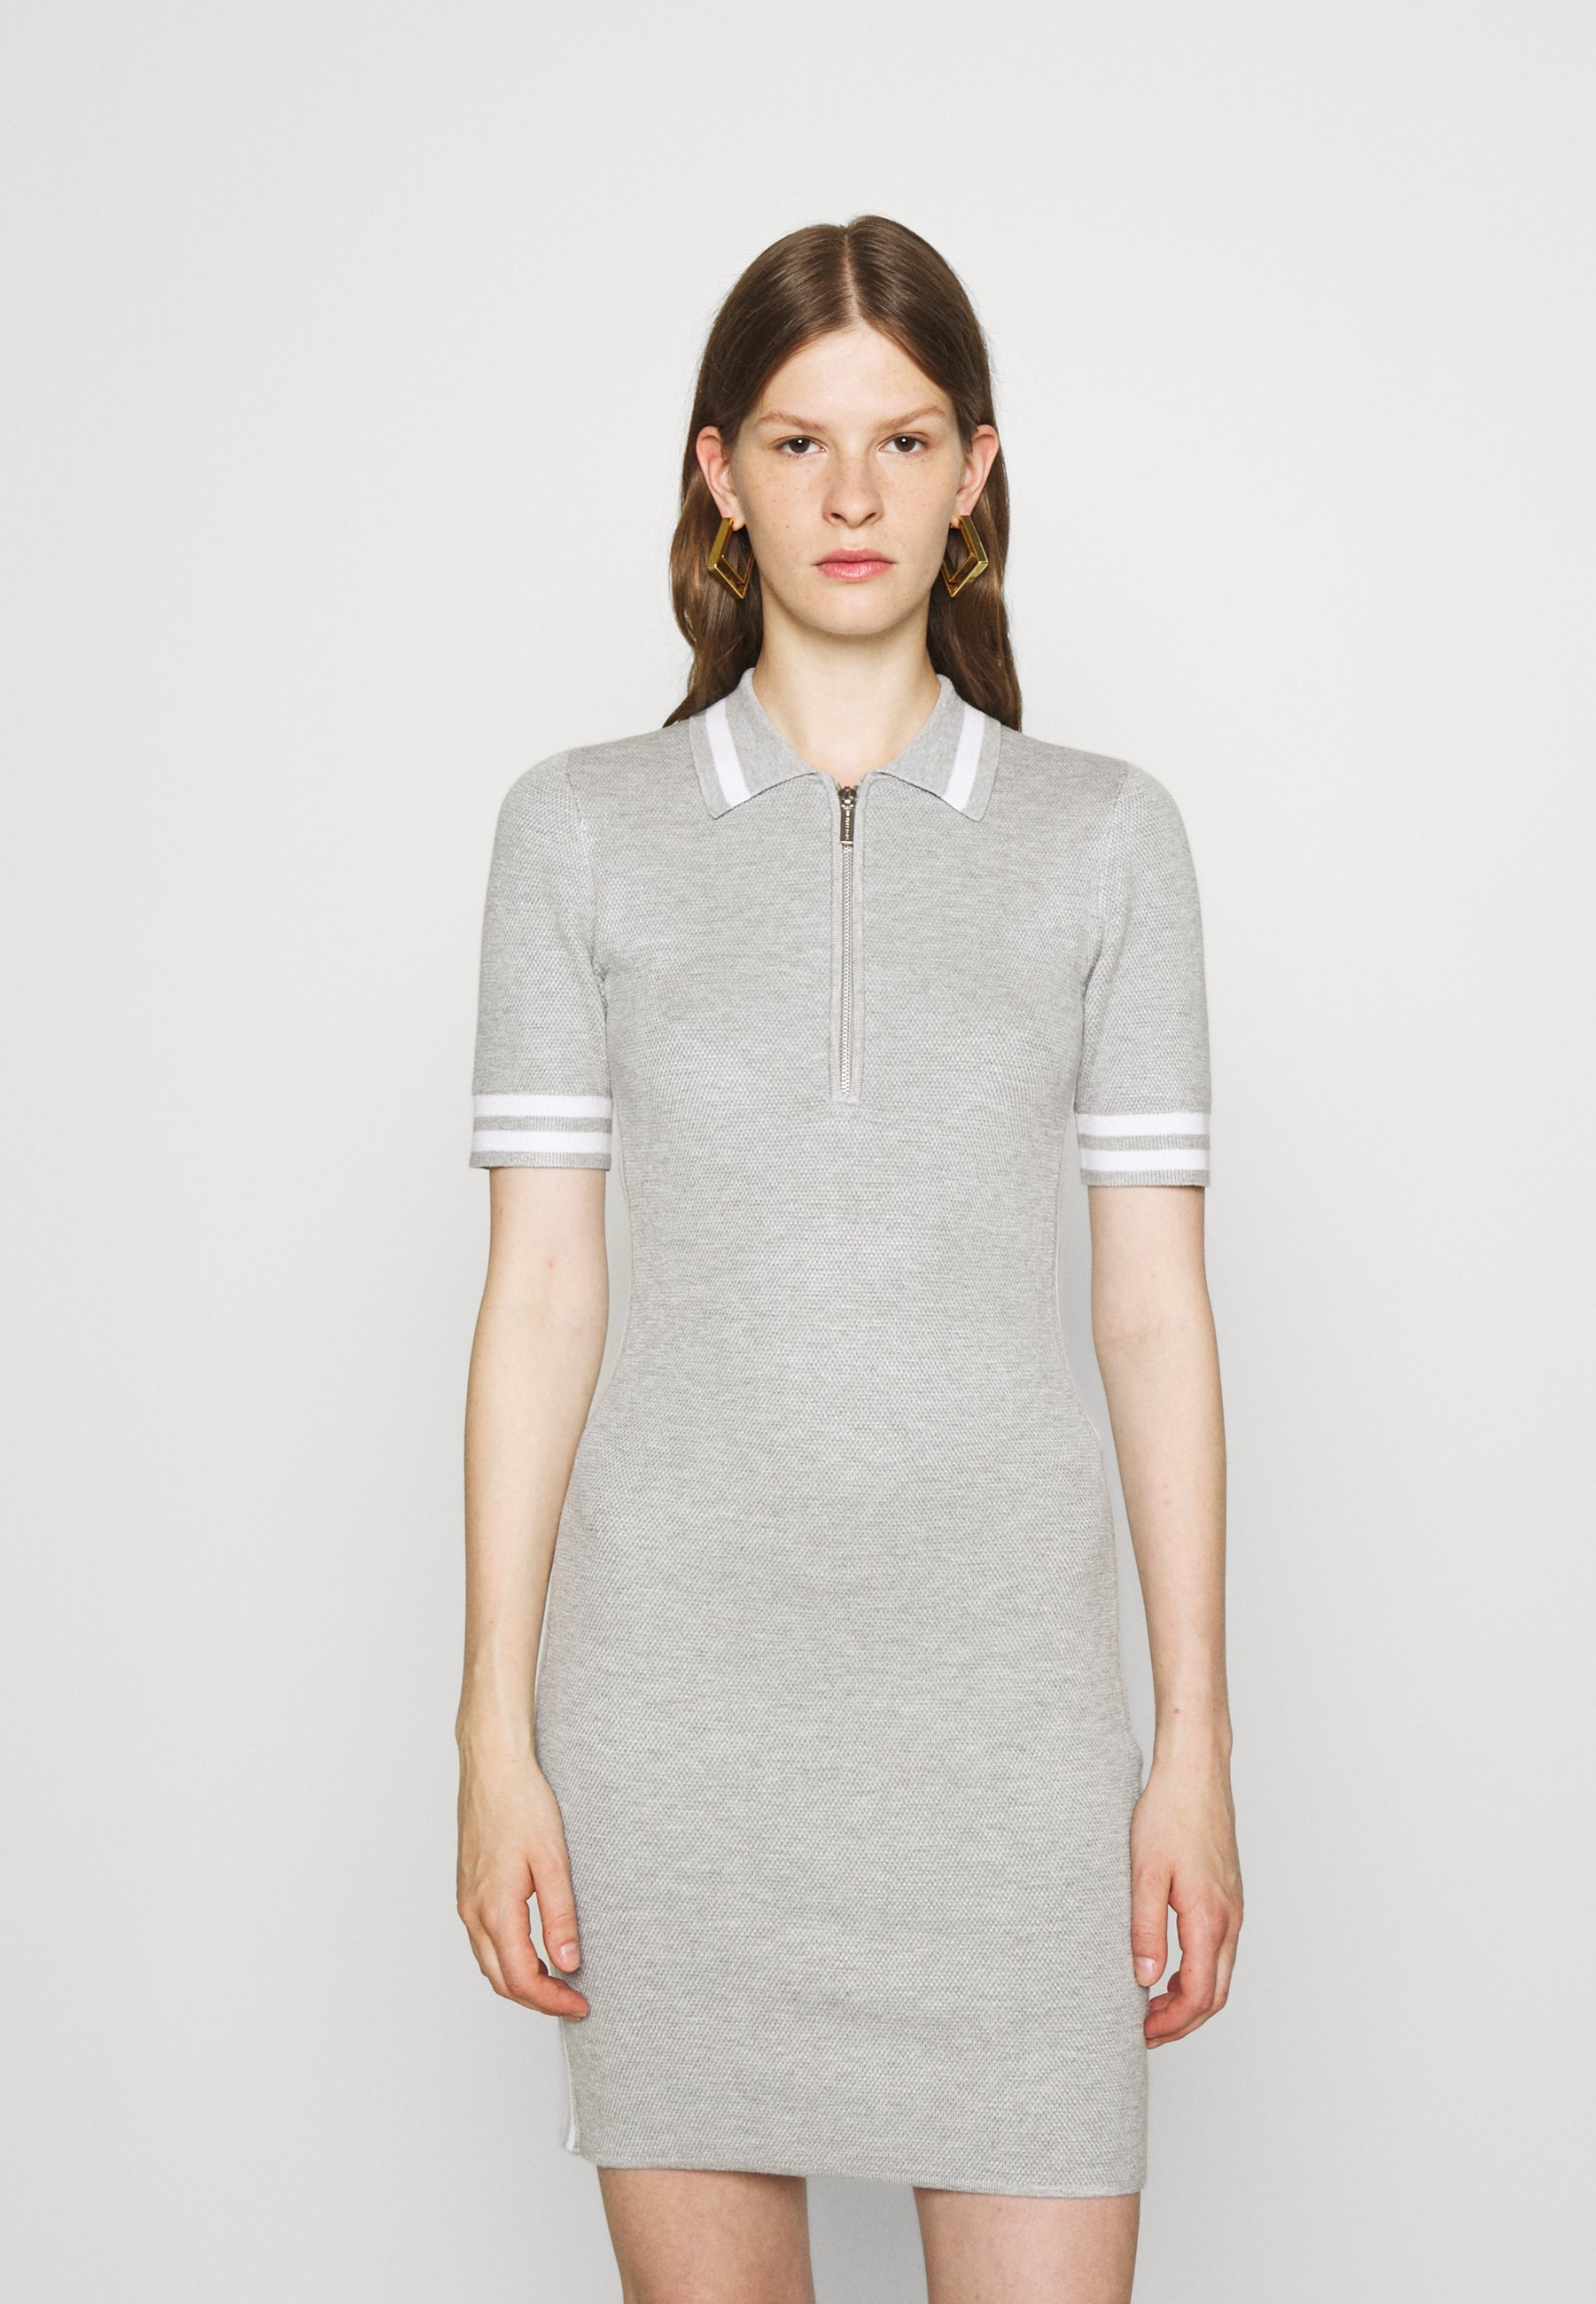 Damen LOGO TAPE HALF ZIP DRESS - Strickkleid